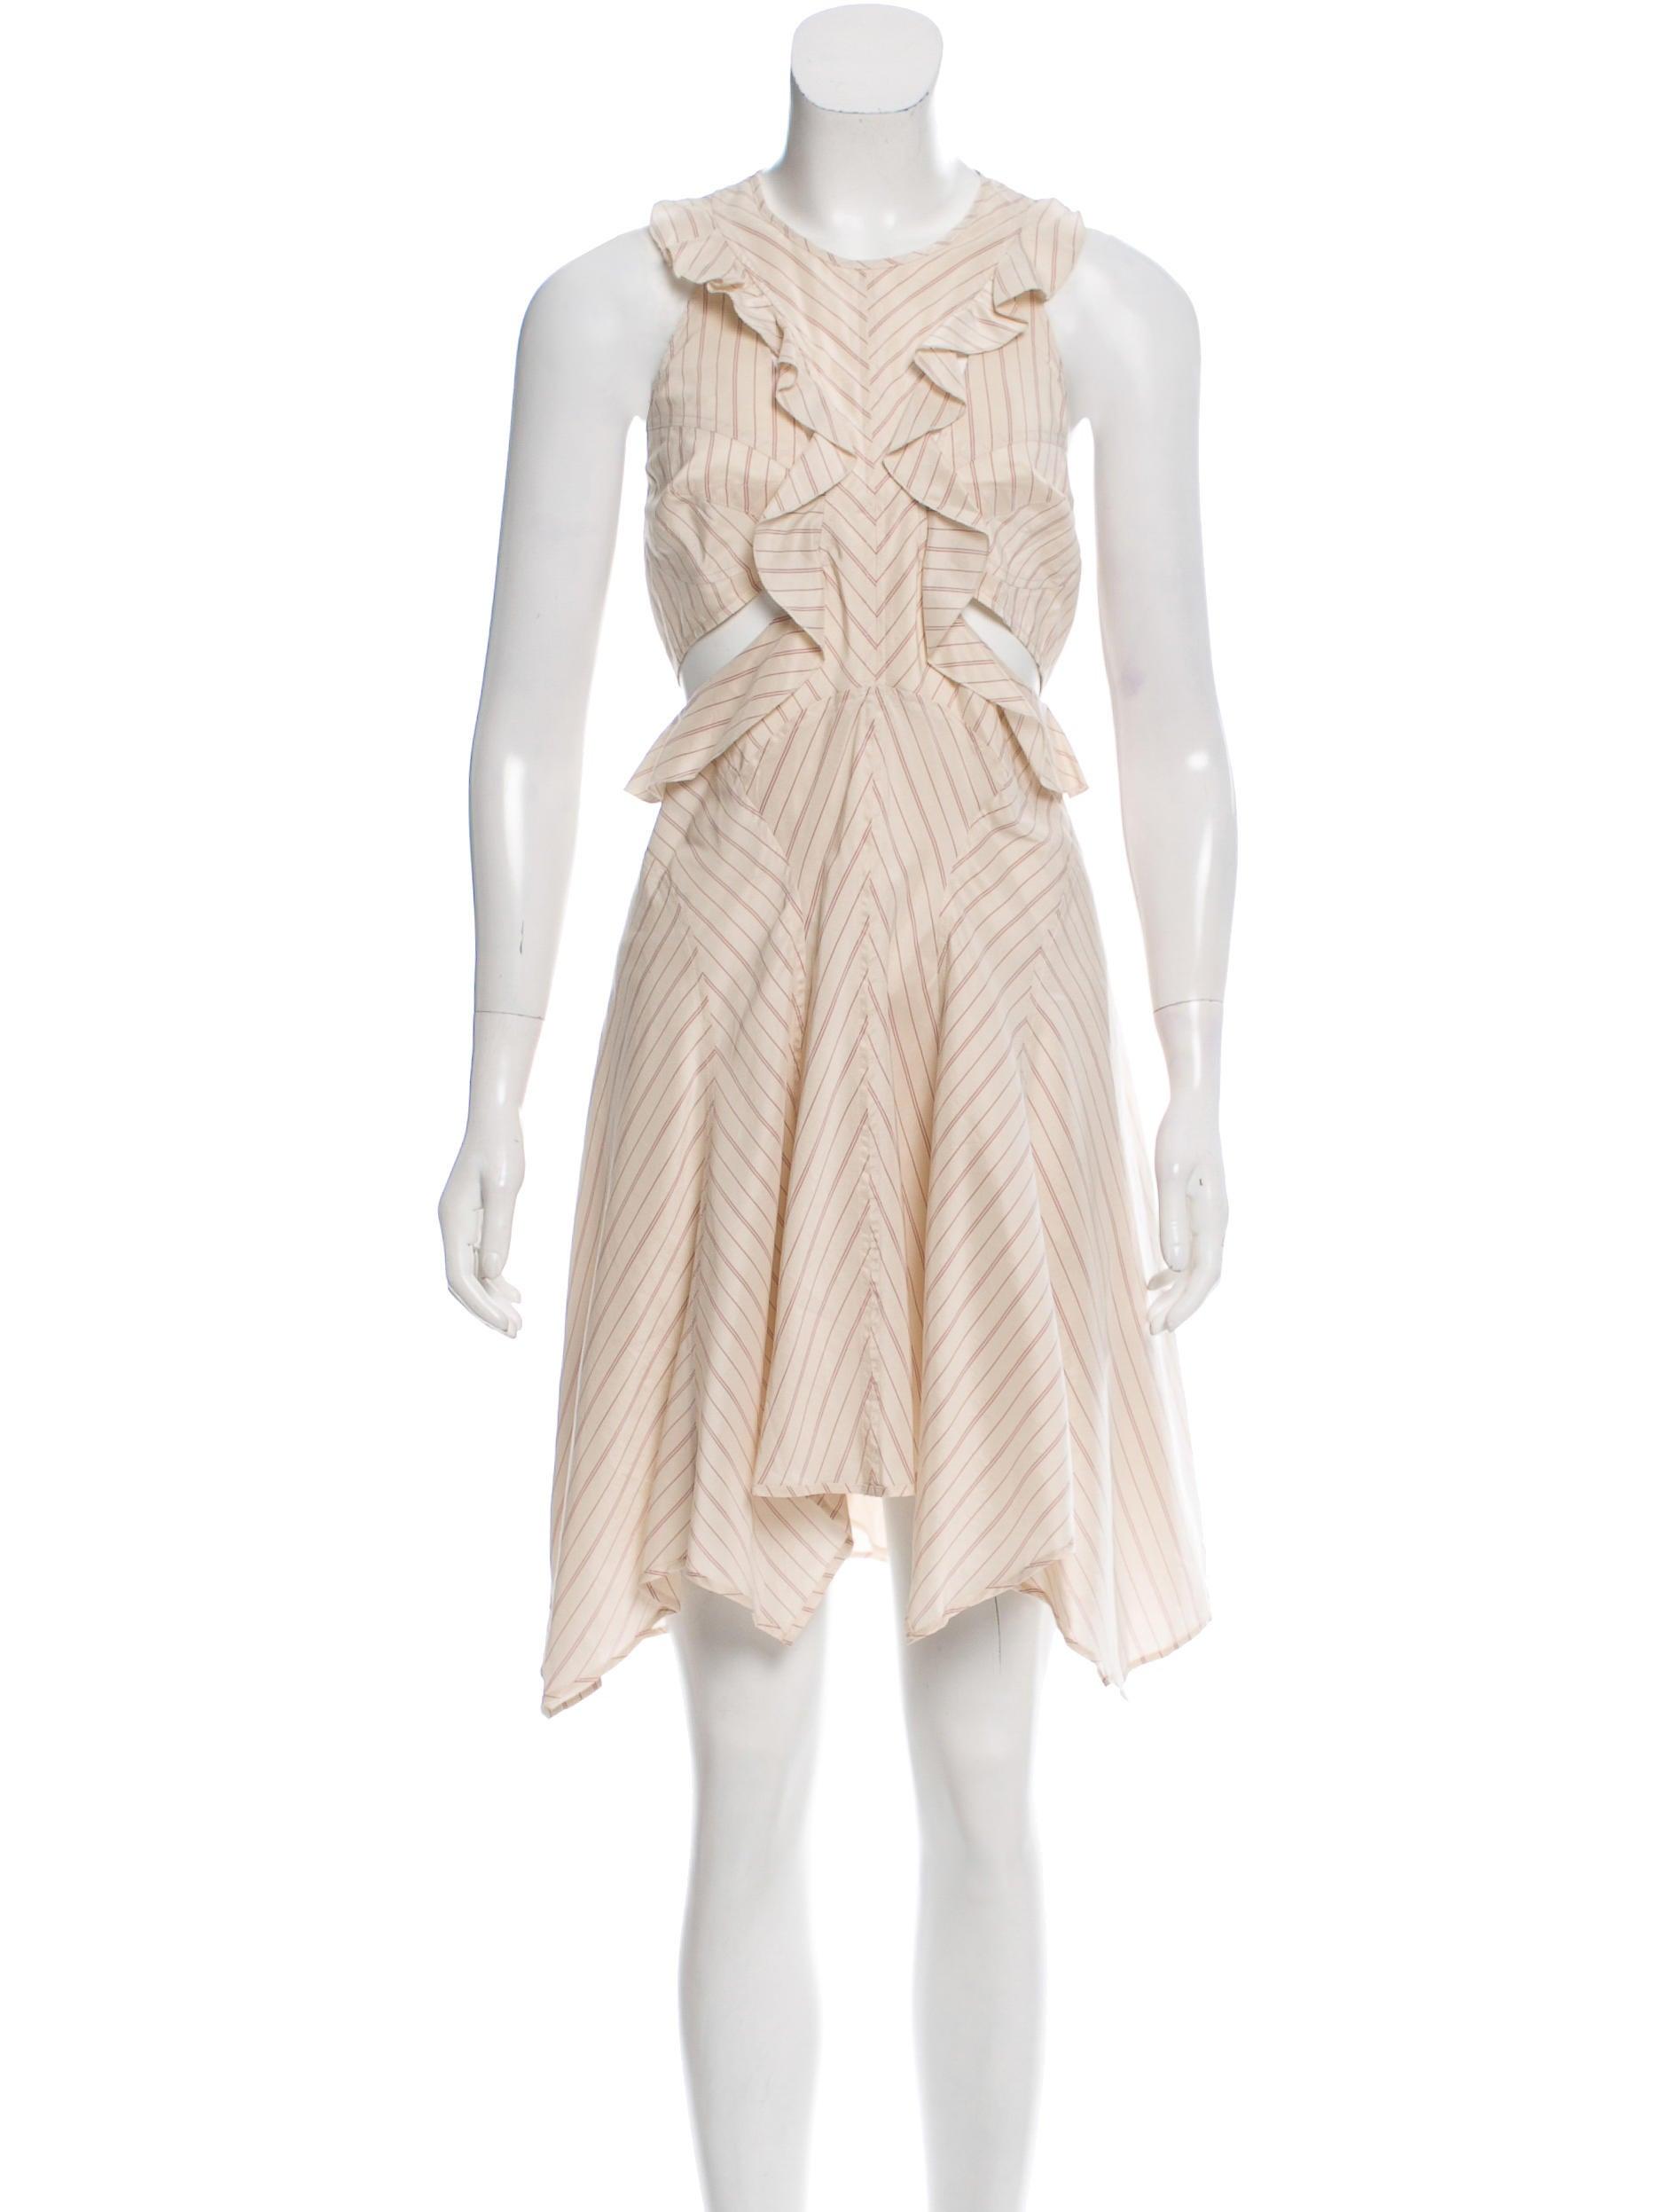 Isabel marant silk shelly dress w tags clothing for Isabel marant shirt dress